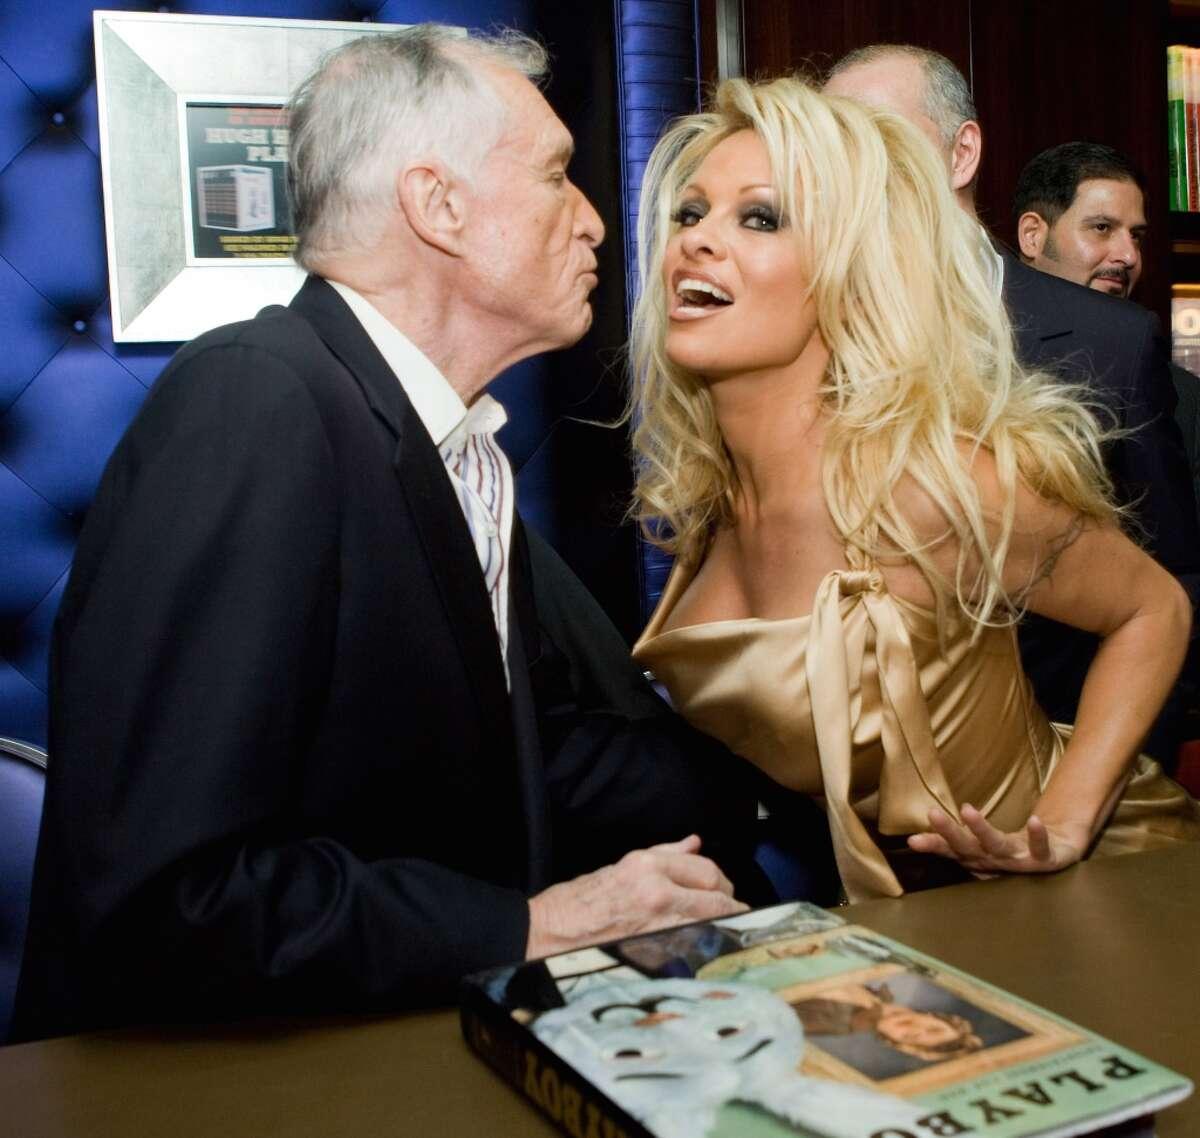 Playboy founder Hugh Hefner and model Pamela Anderson attend the Hugh Hefner Autographs Limited Edition Six-Volume Anthology Party by Taschen on December 10, 2009 in Los Angeles.